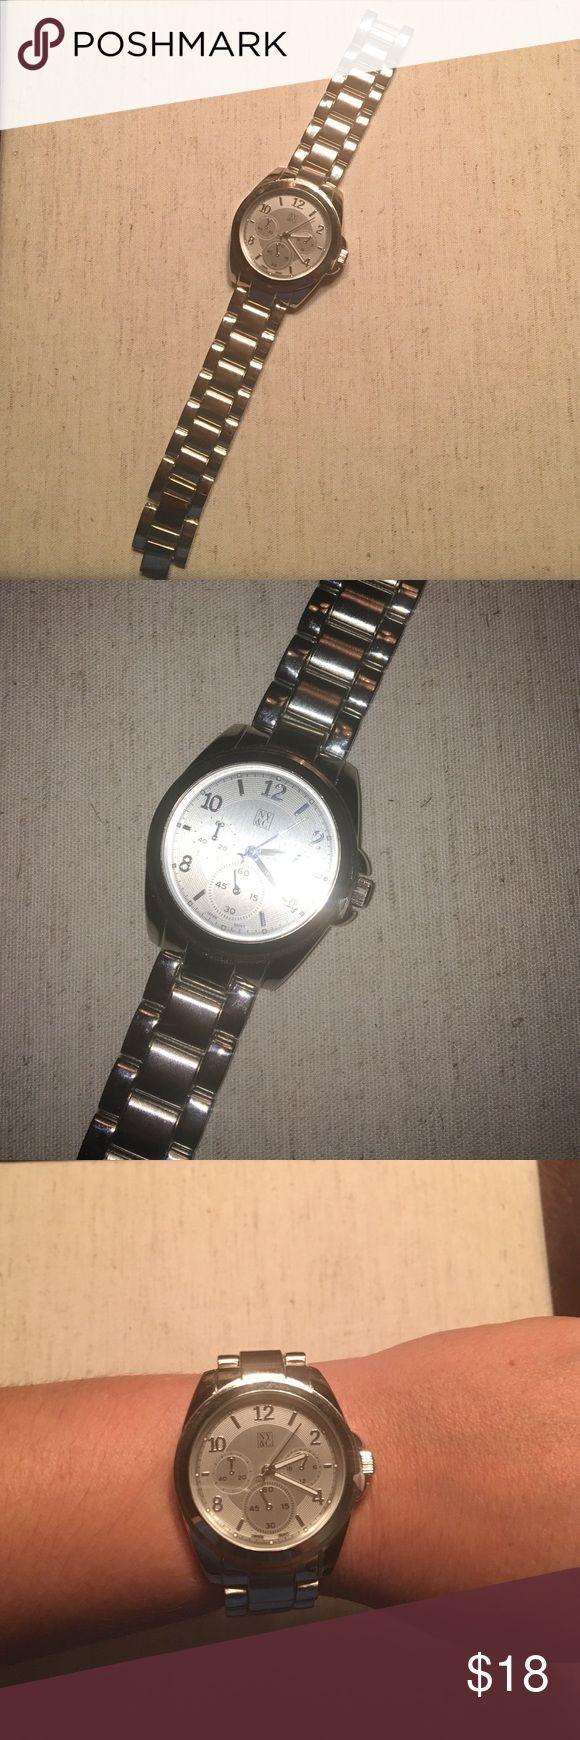 NY & Co boyfriend watch Boyfriend watch New York & Company Accessories Watches